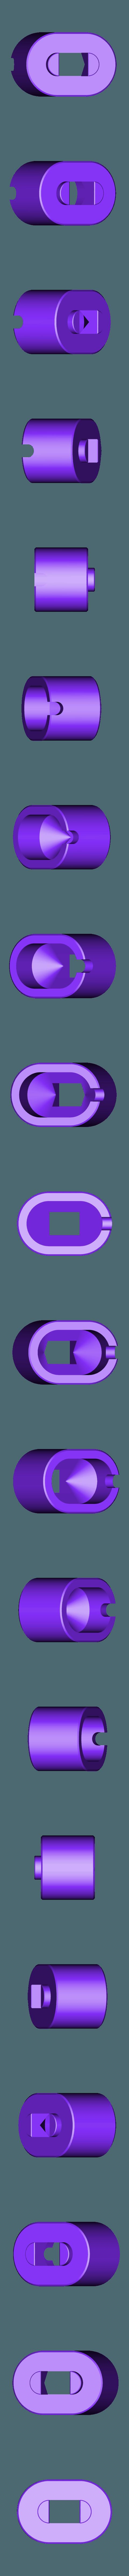 candice-charger.stl Download free STL file phone holder - candice • 3D printable design, clem-c2